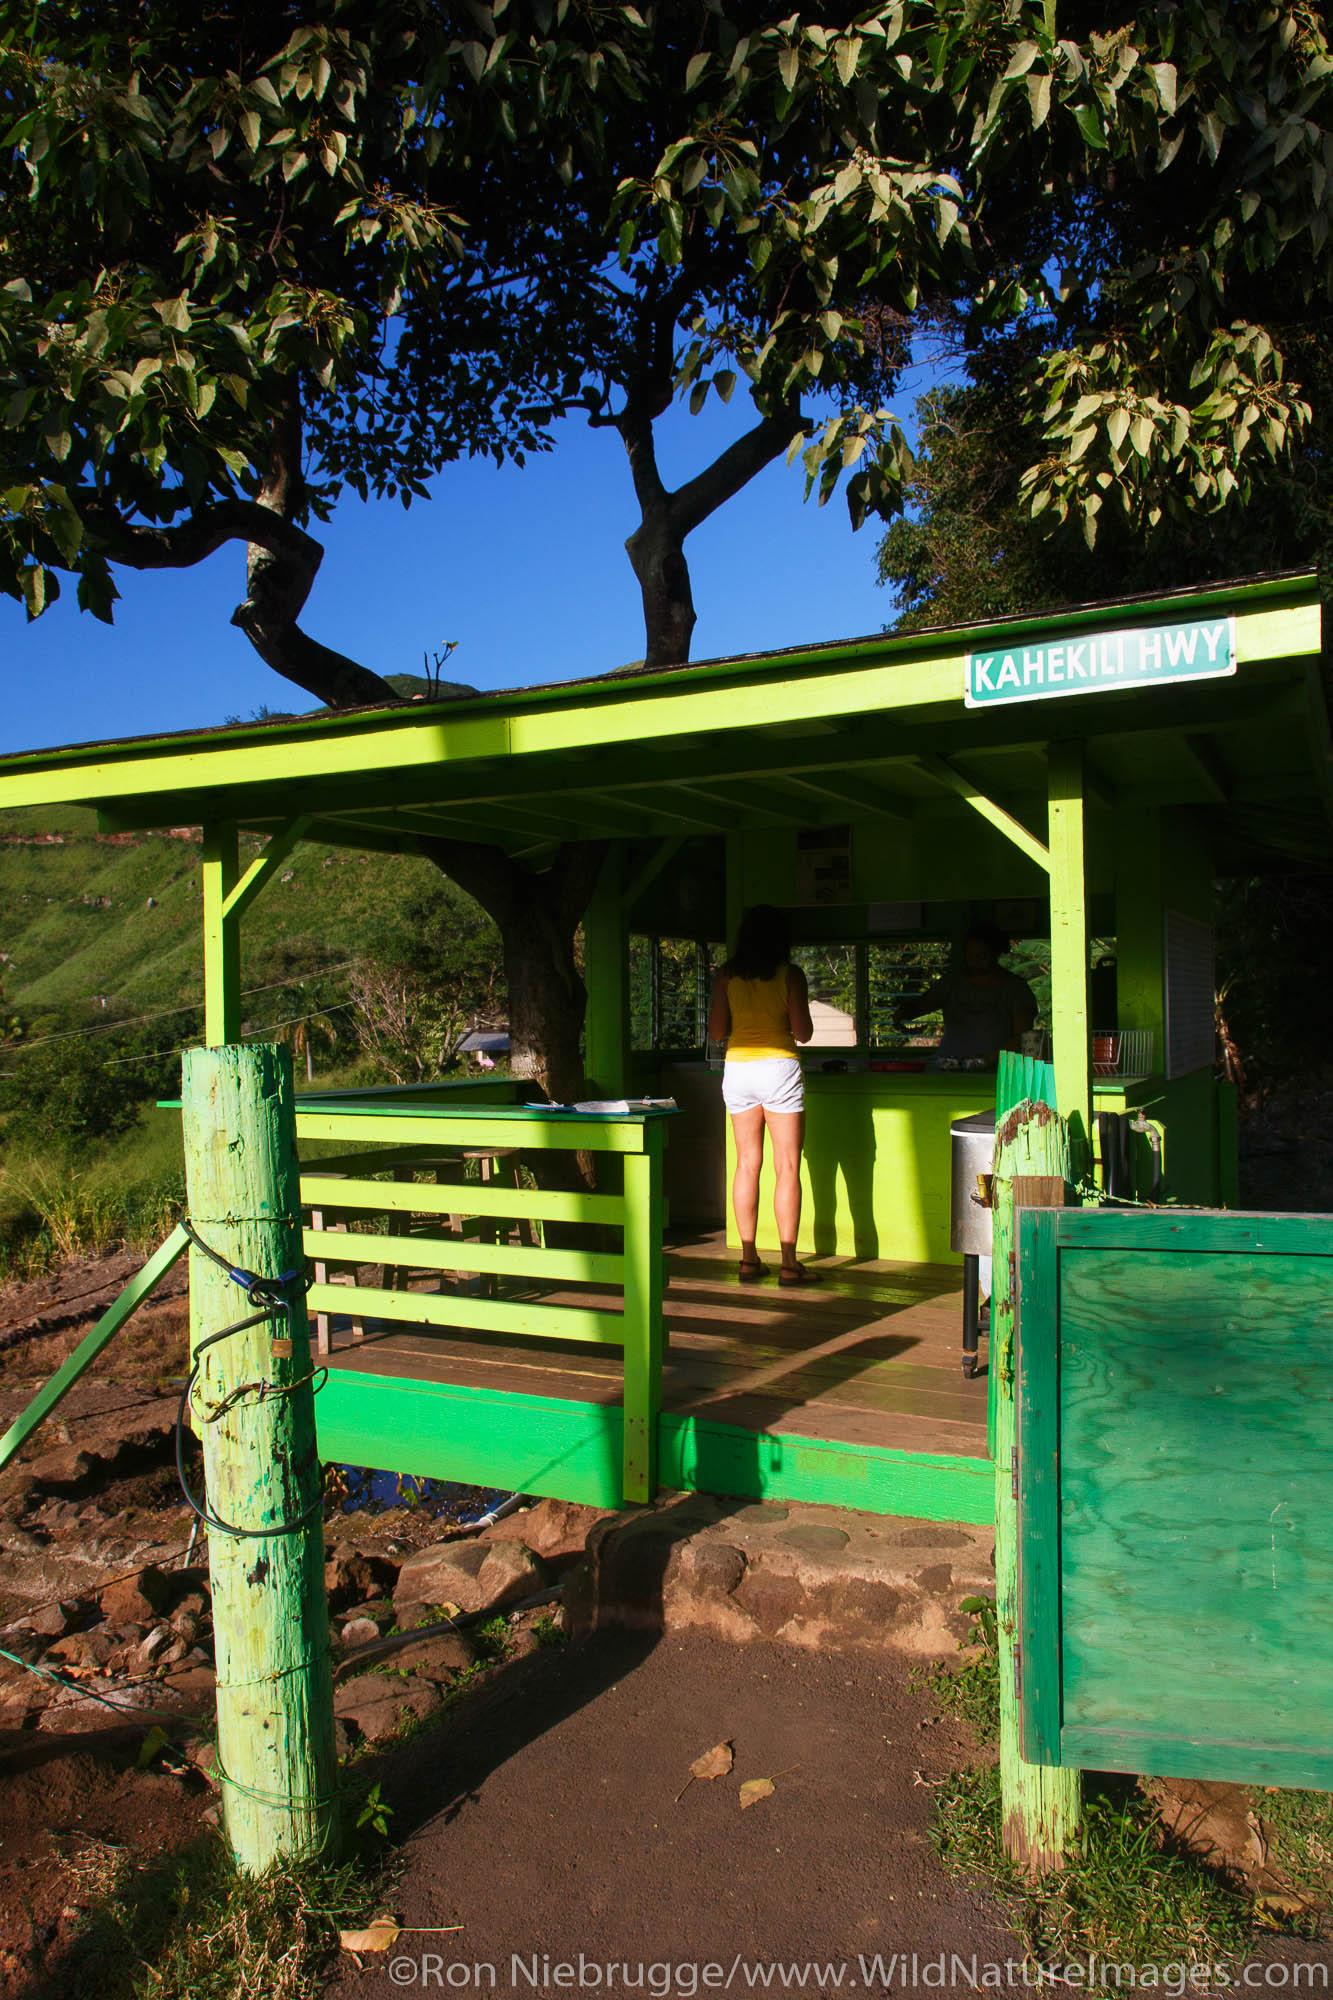 Julia's banana bread stand, Kahakuloa Village, Maui, Hawaii.